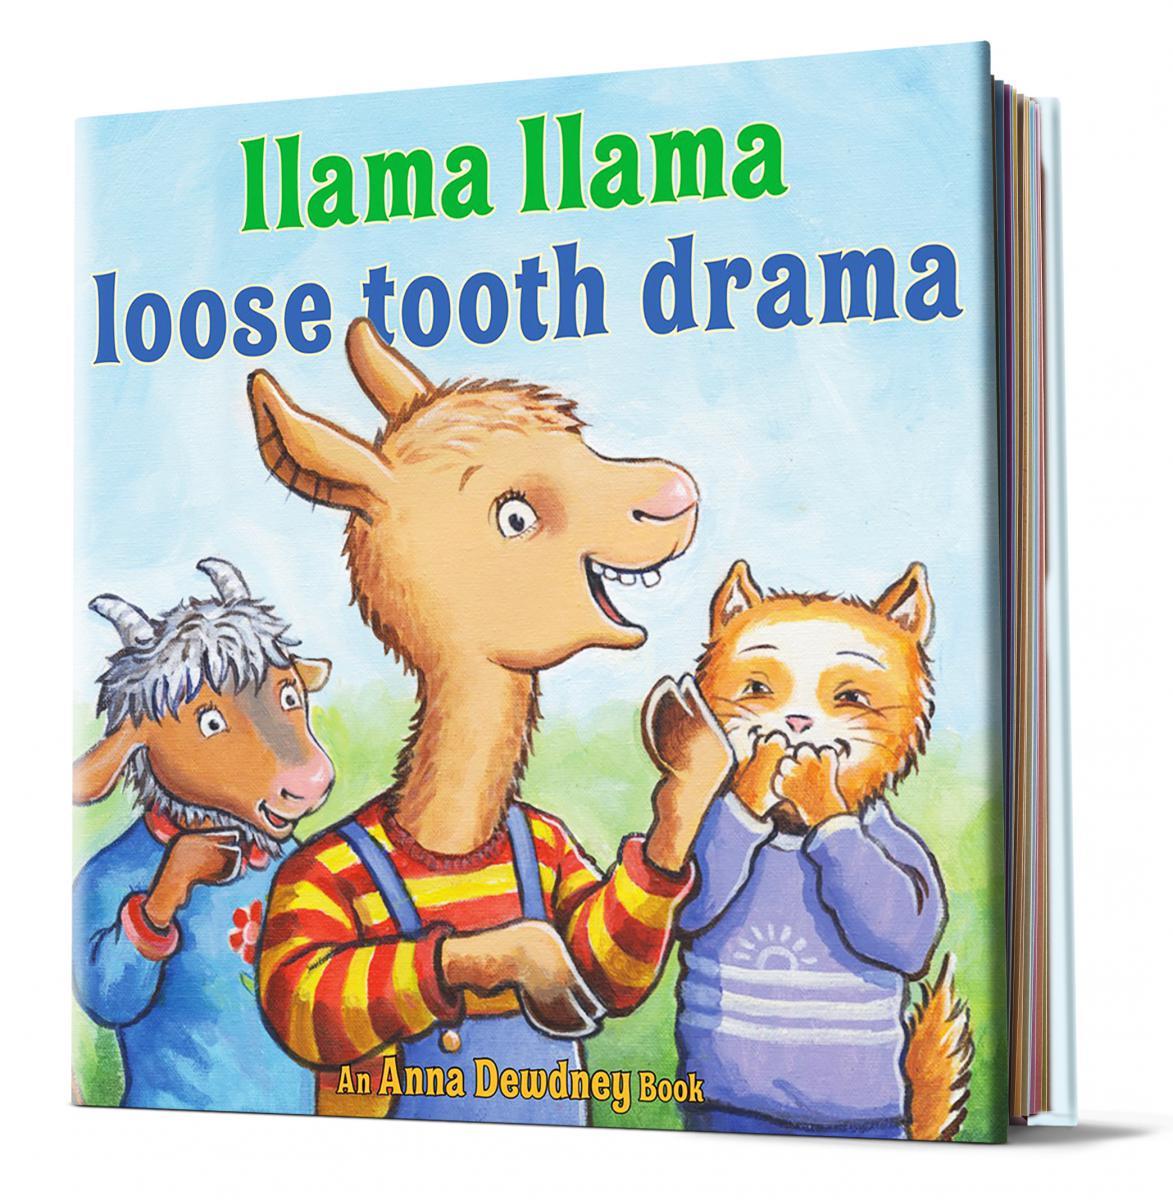 Llama Llama: Loose Tooth Drama